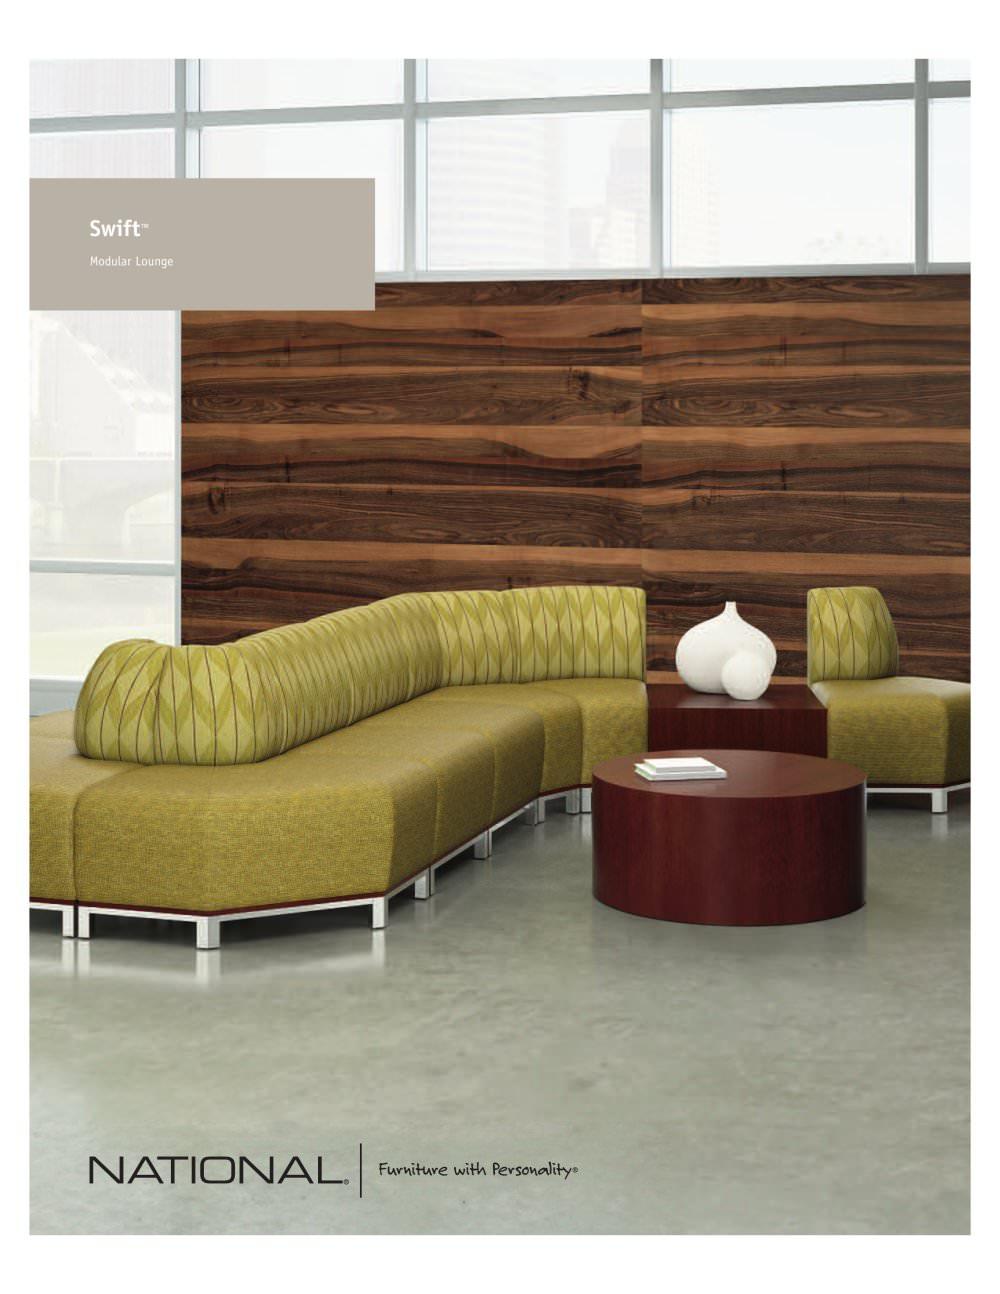 Swift Modular Lounge   1 / 12 Pages